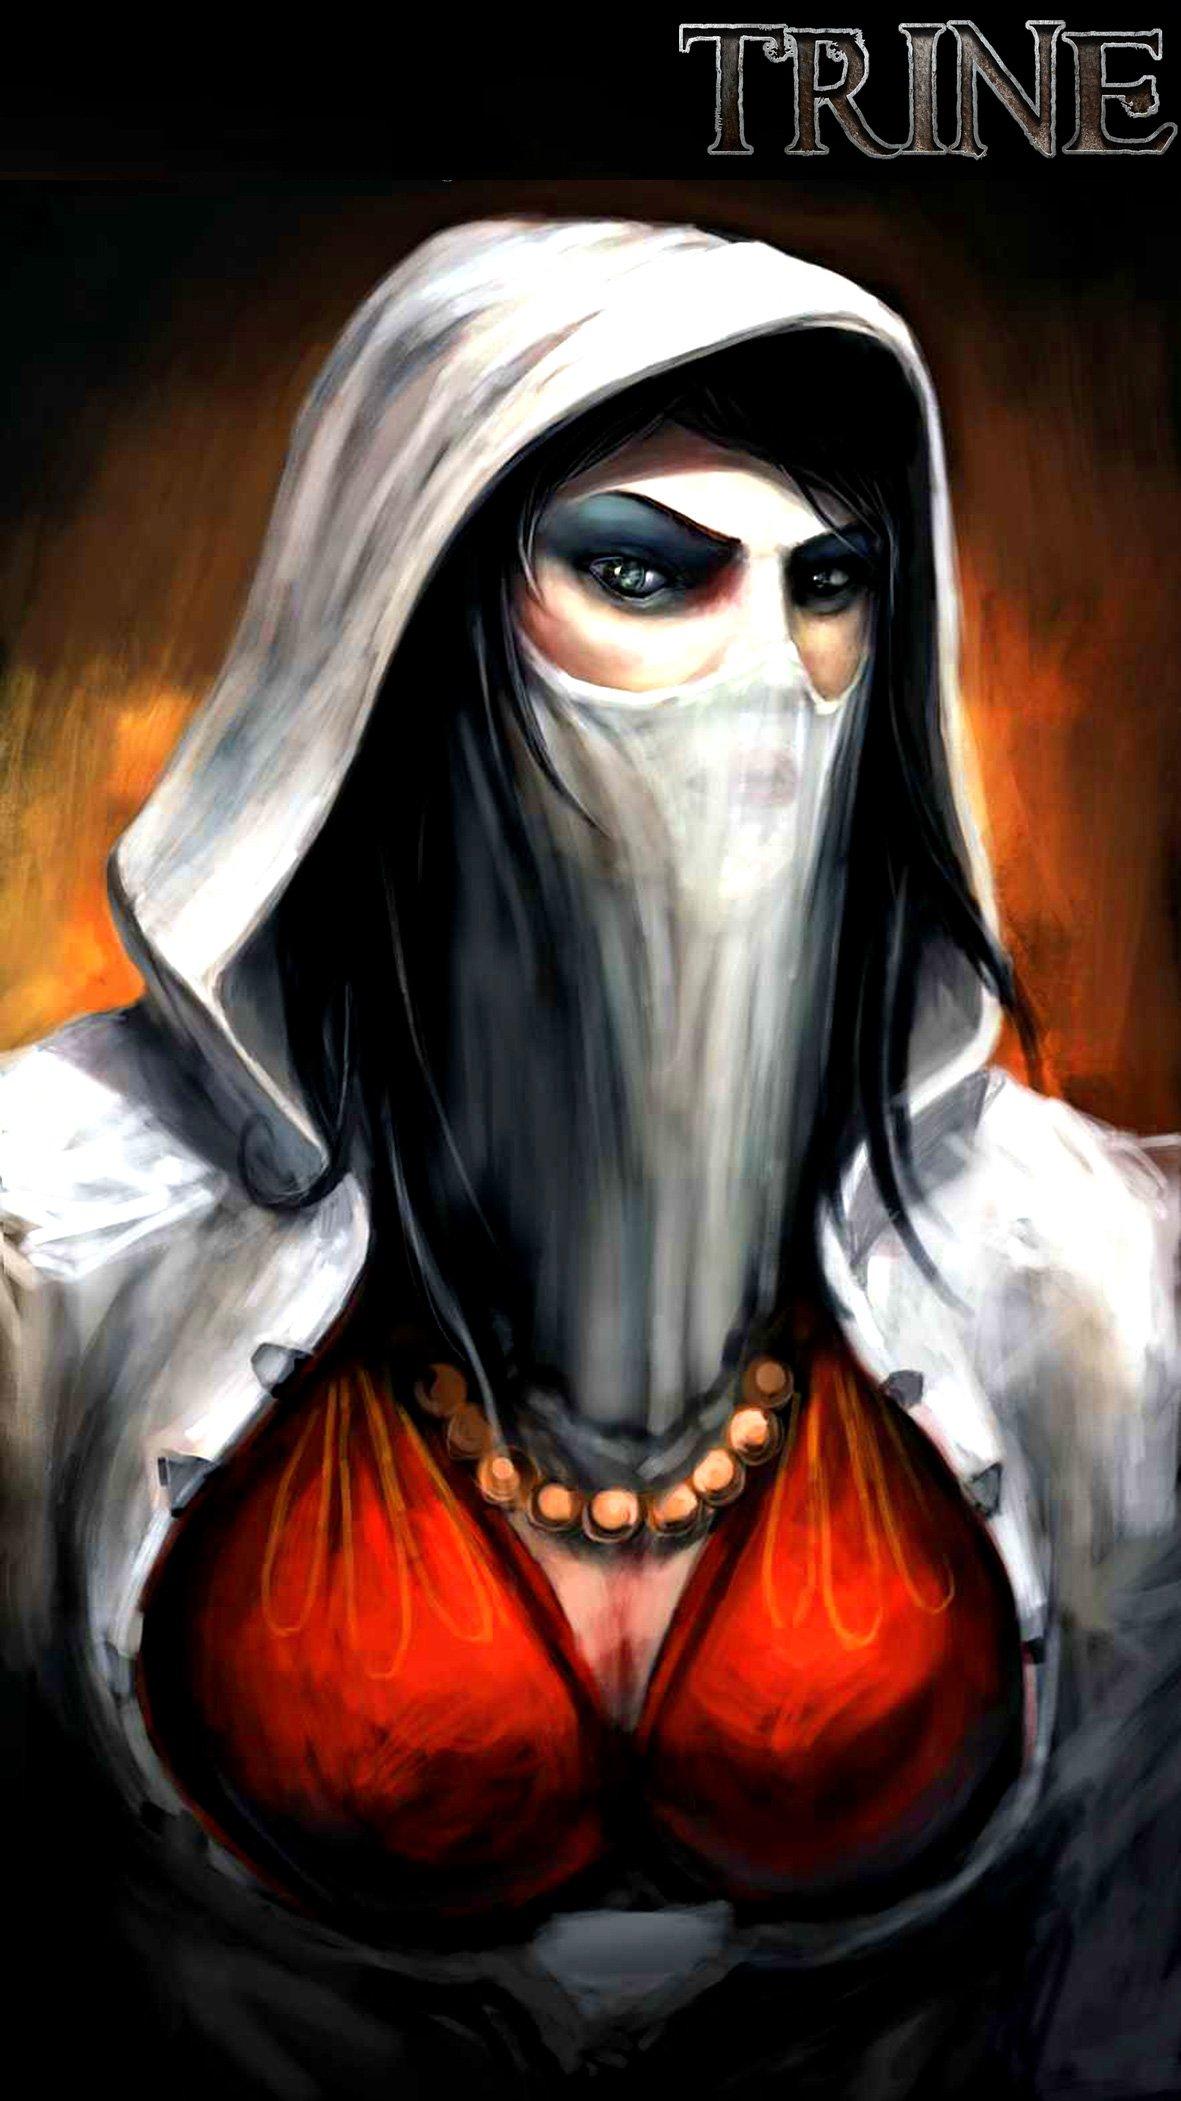 New Trine Art Introduces Zoya The Thief #7795